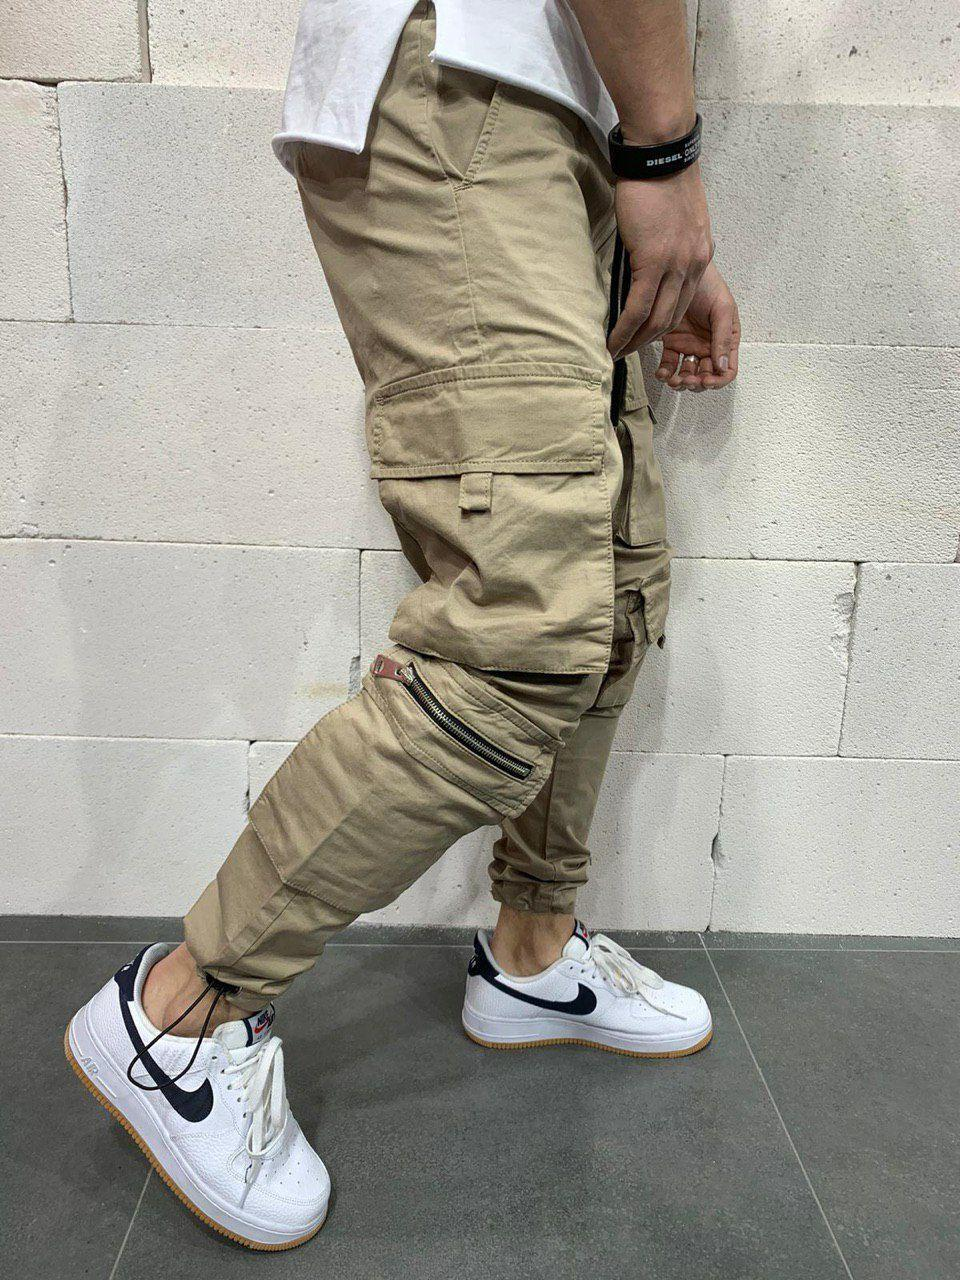 😝 Брюки карго- Мужские штаны карго